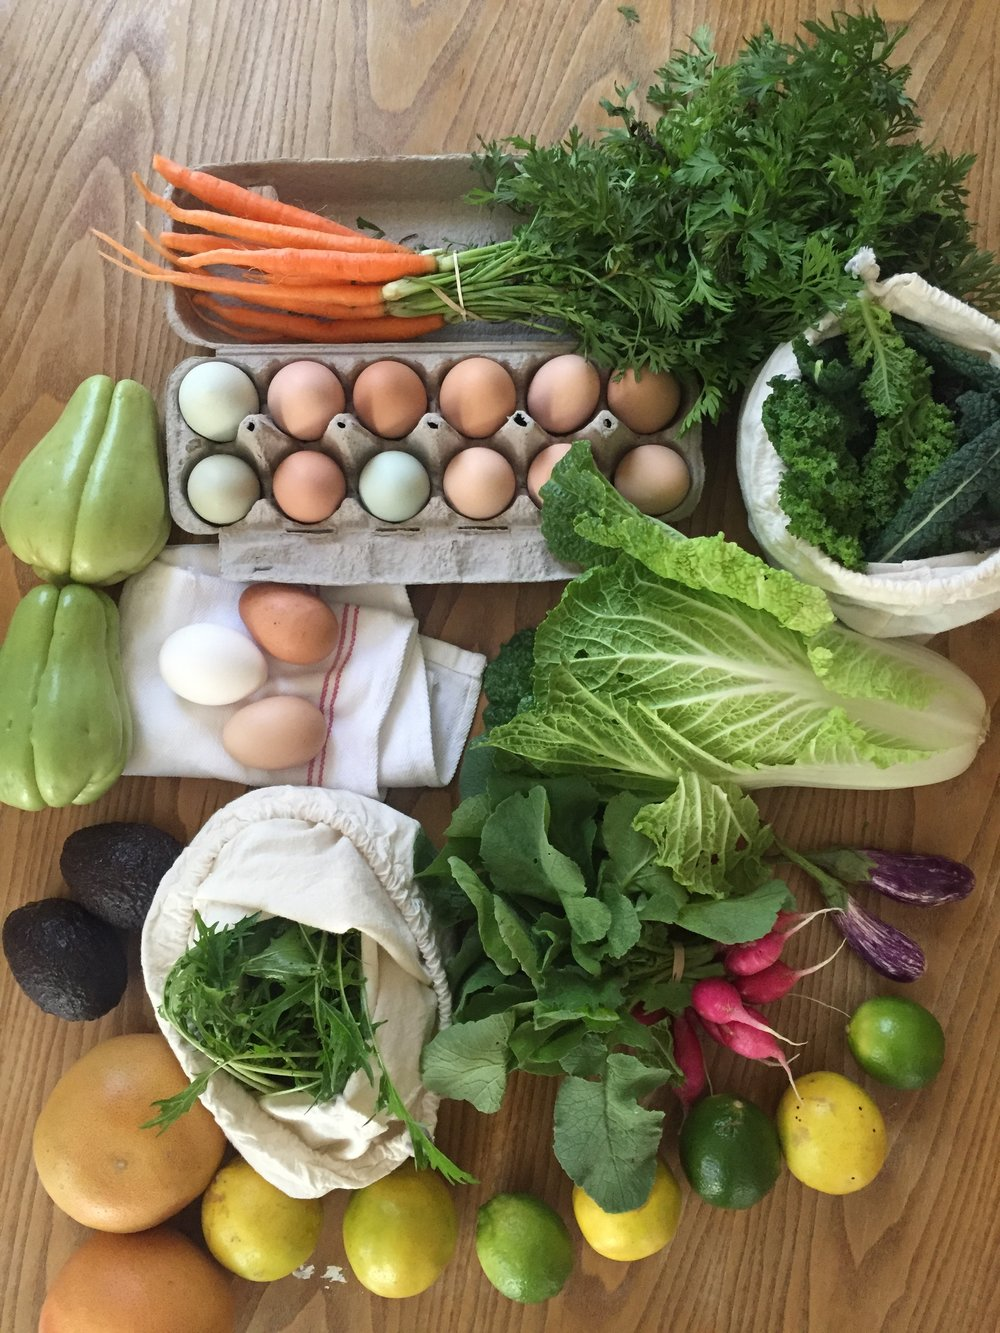 Farmer's market shopping. Re-used Egg carton.